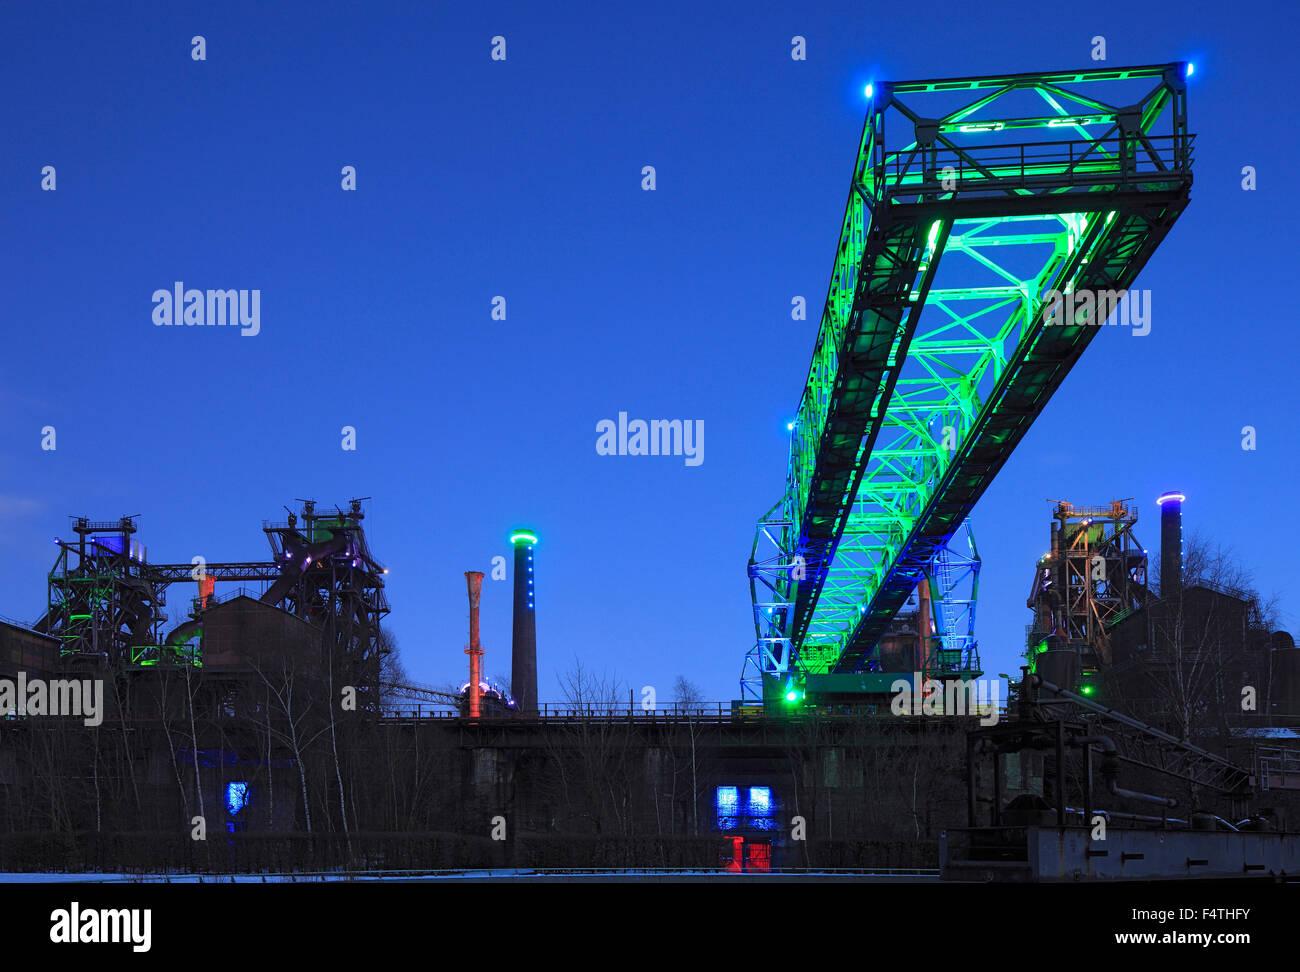 Germany, Europe, North Rhine-Westphalia, Duisburg, Meiderich, route of industrial culture, Emscherpark, lights, - Stock Image